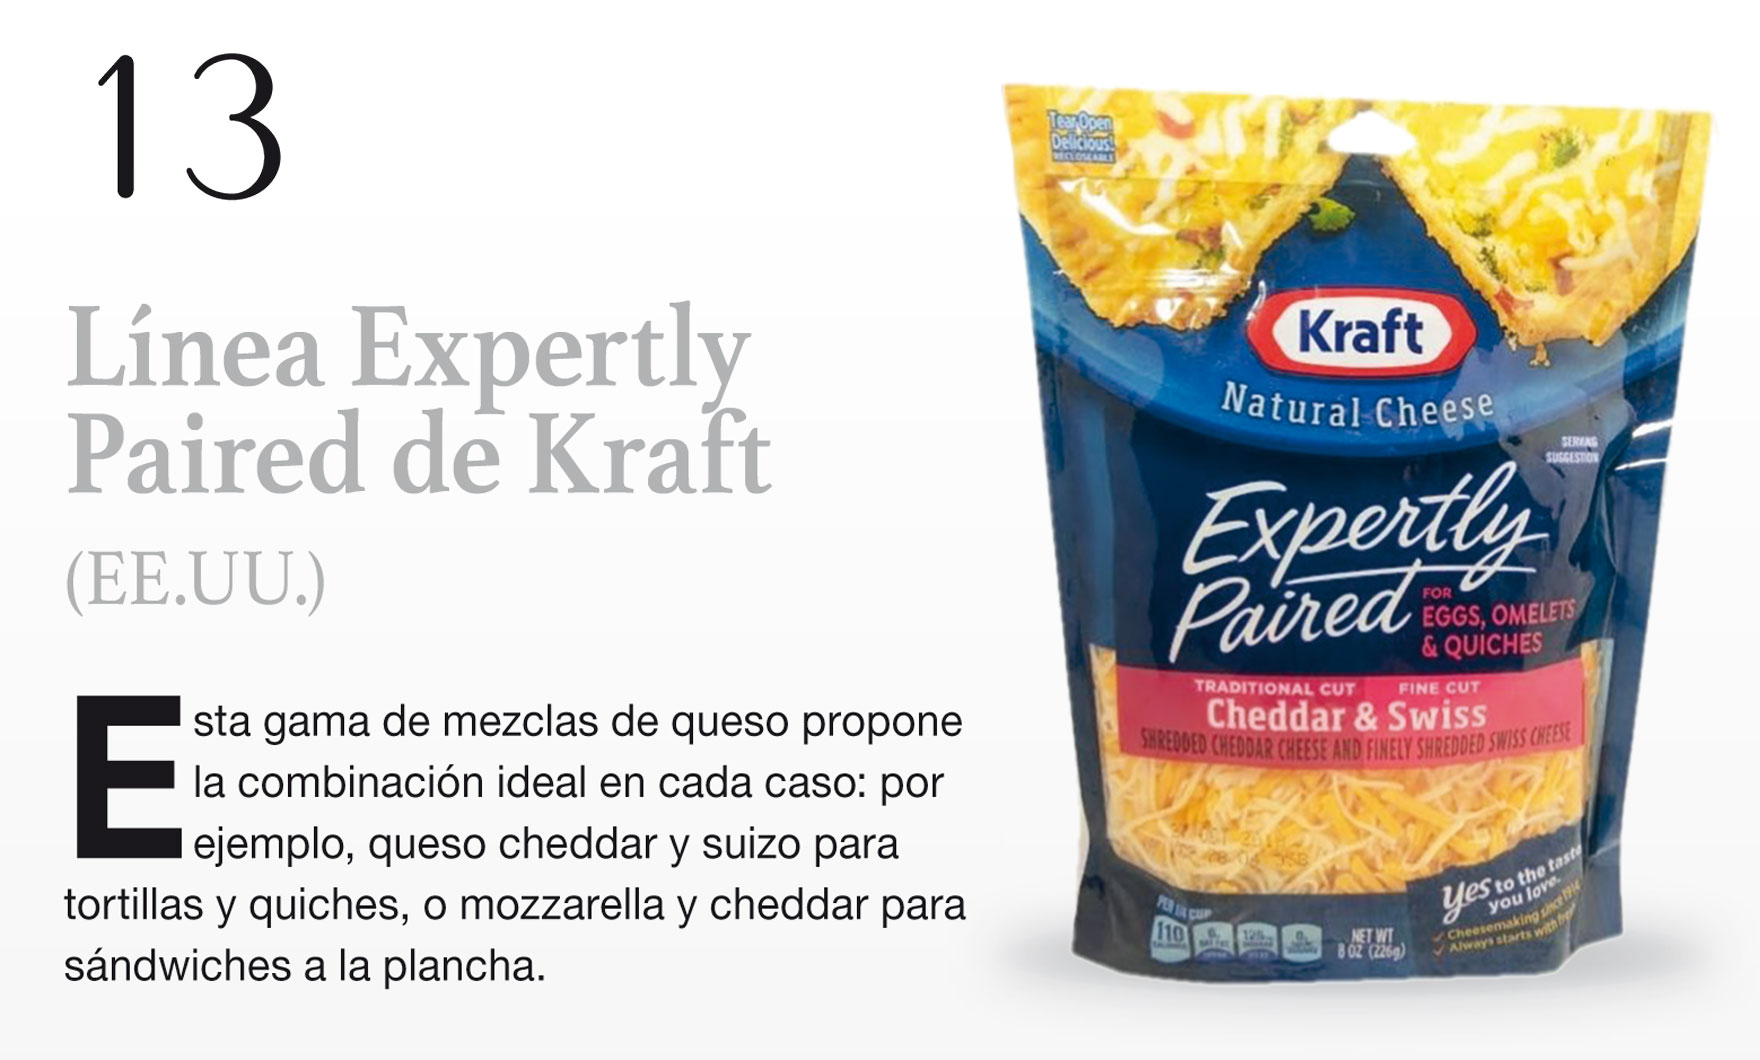 Línea Expertly Paired de Kraft (EE.UU.)